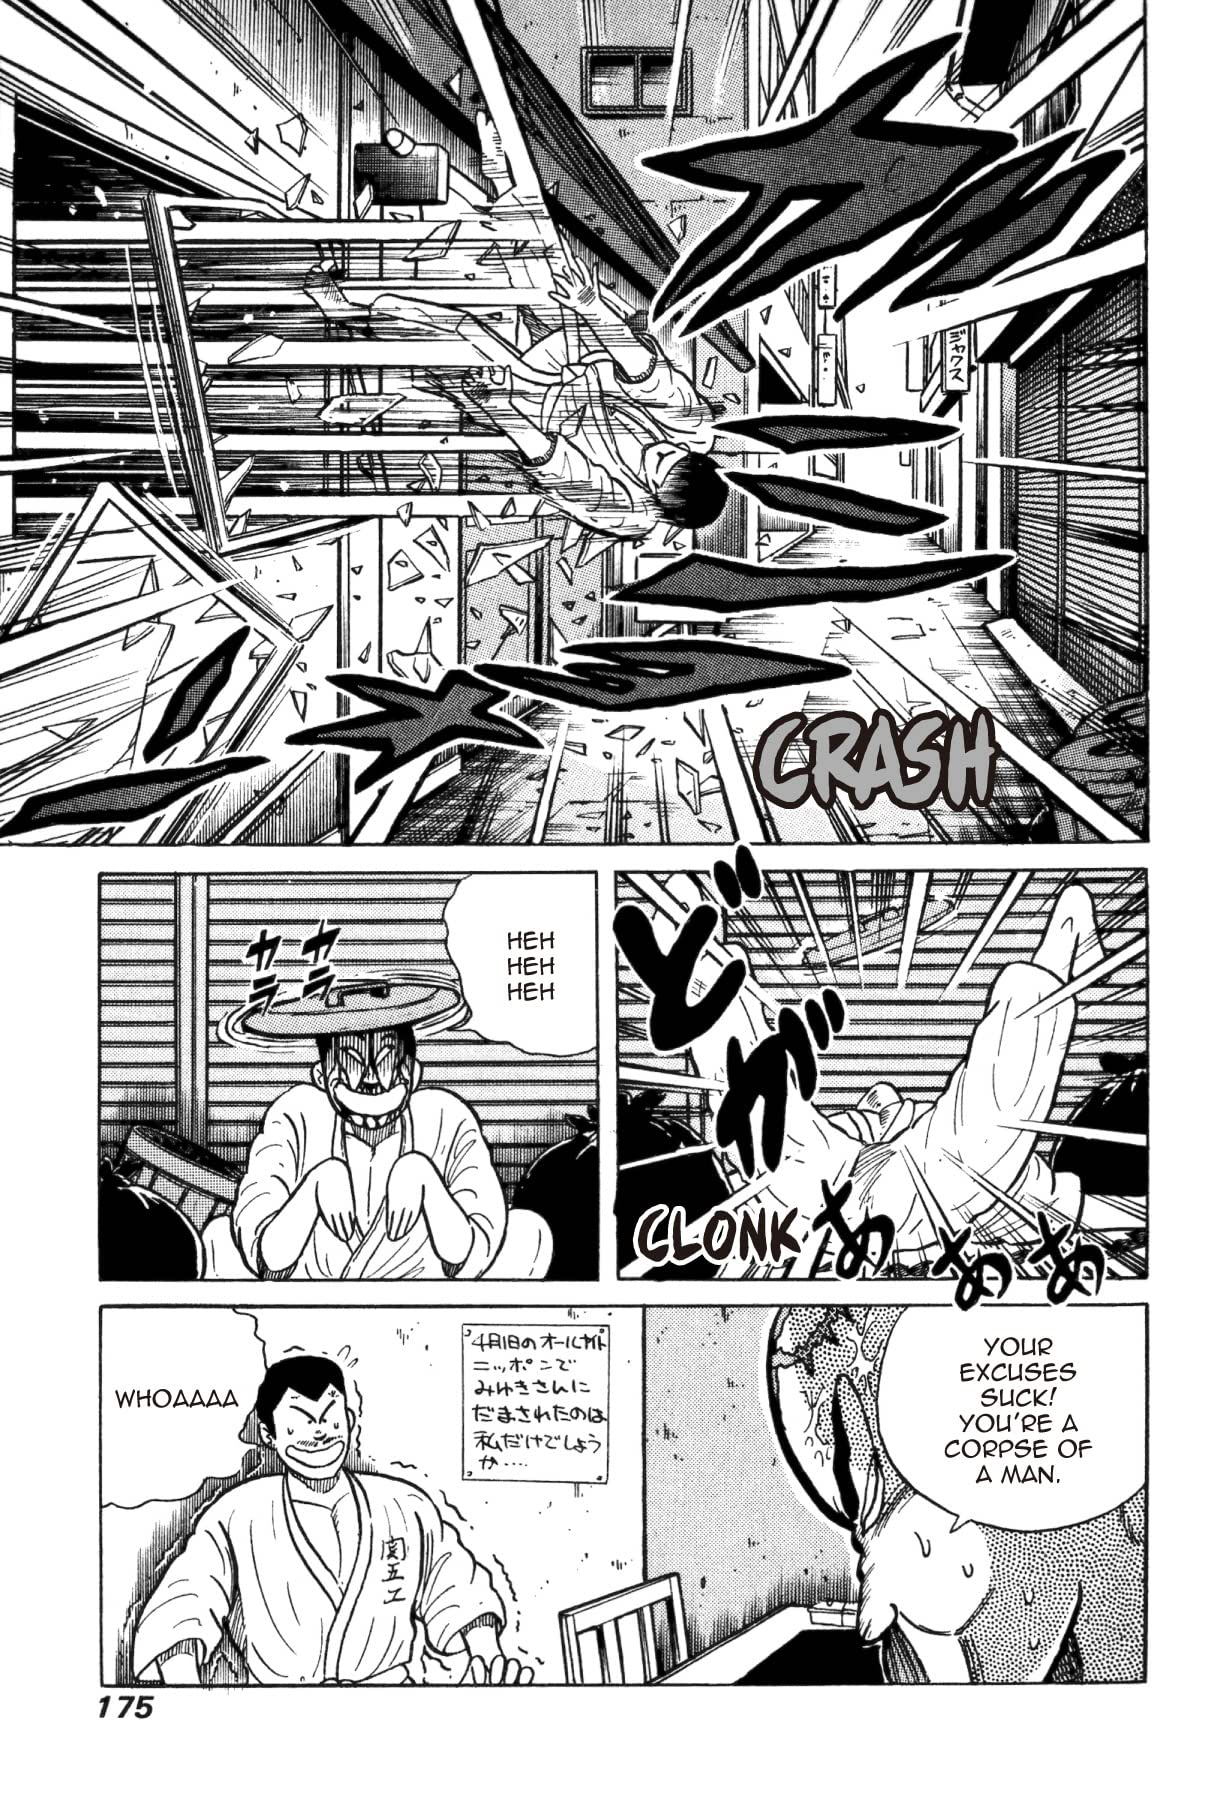 Osu! Karate Club #20